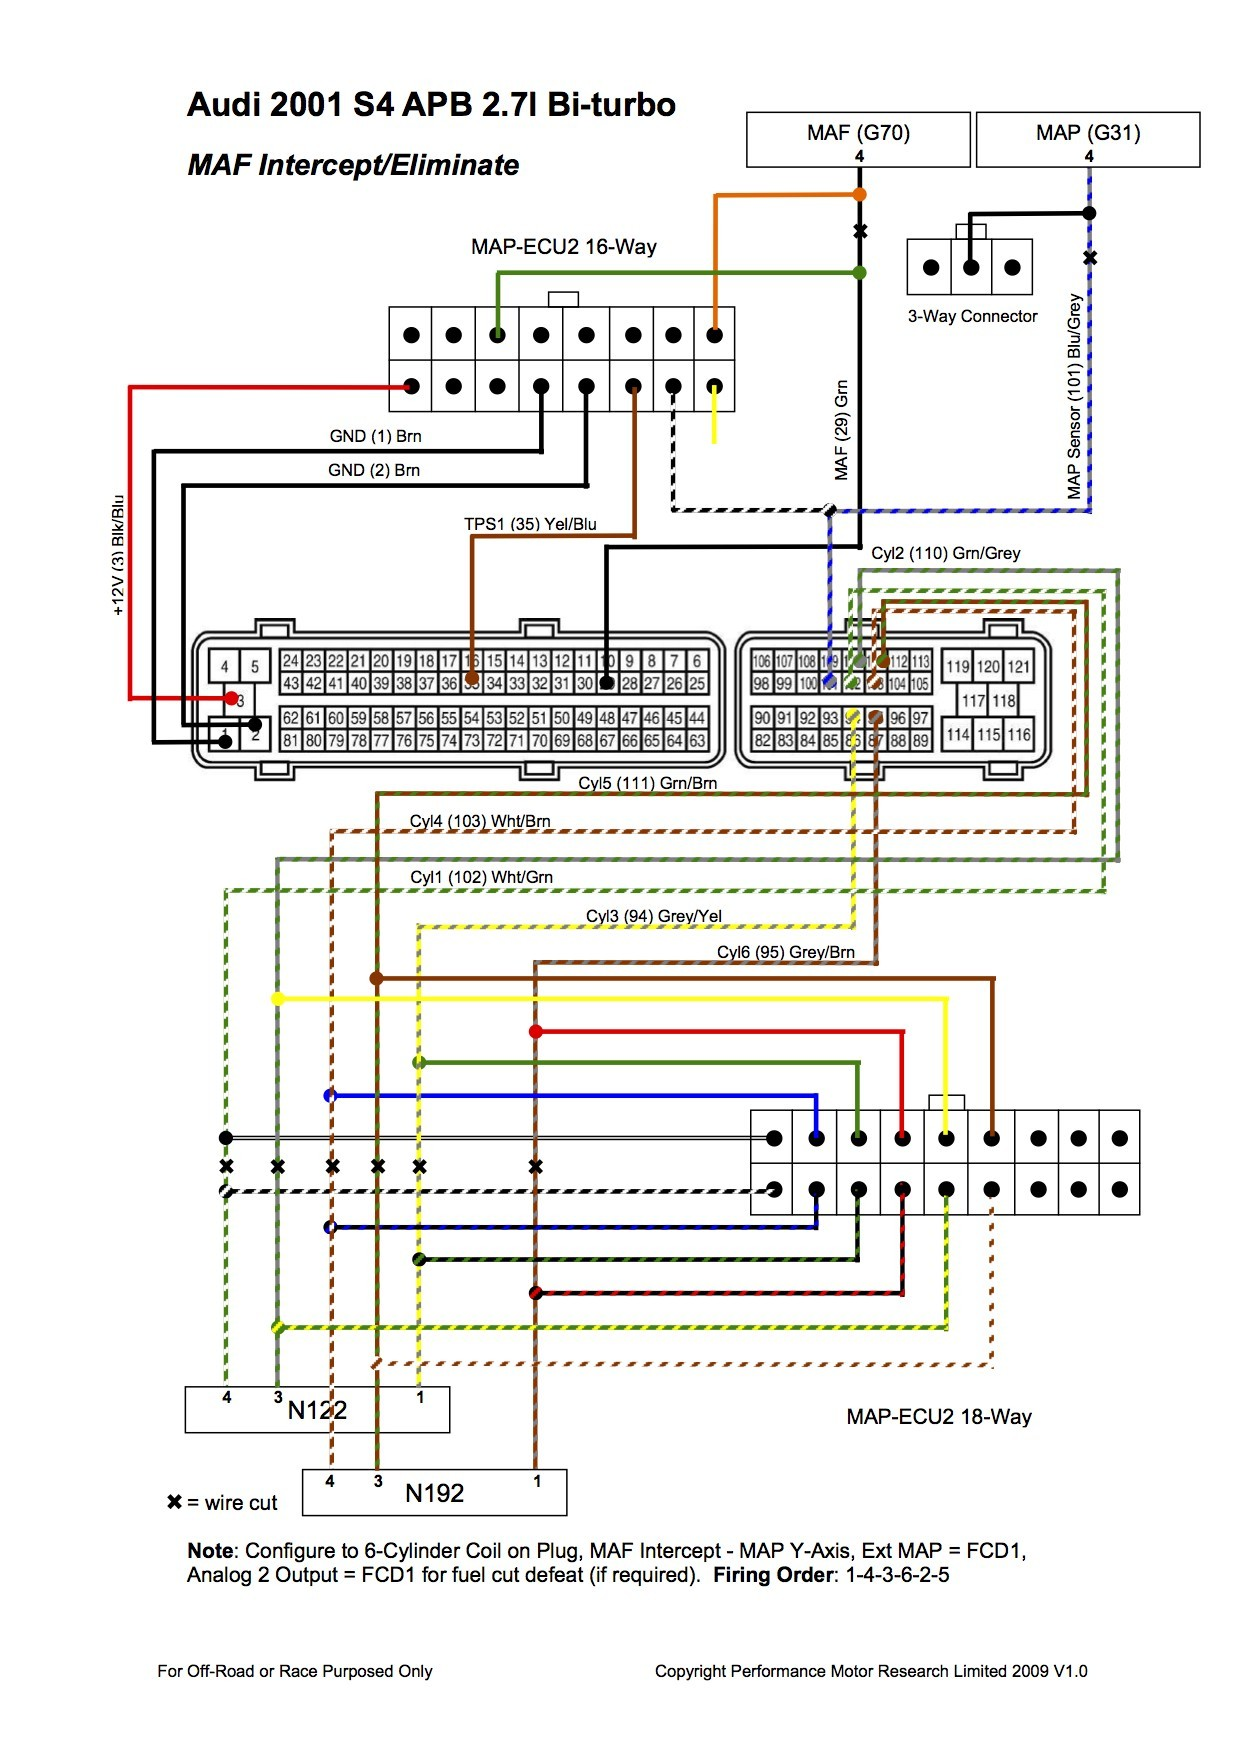 1995 Dodge Ram 1500 Transmission Wiring Diagram Best 2002 Dodge Ram 2500 Radio Wiring Diagram Wiring Solutions